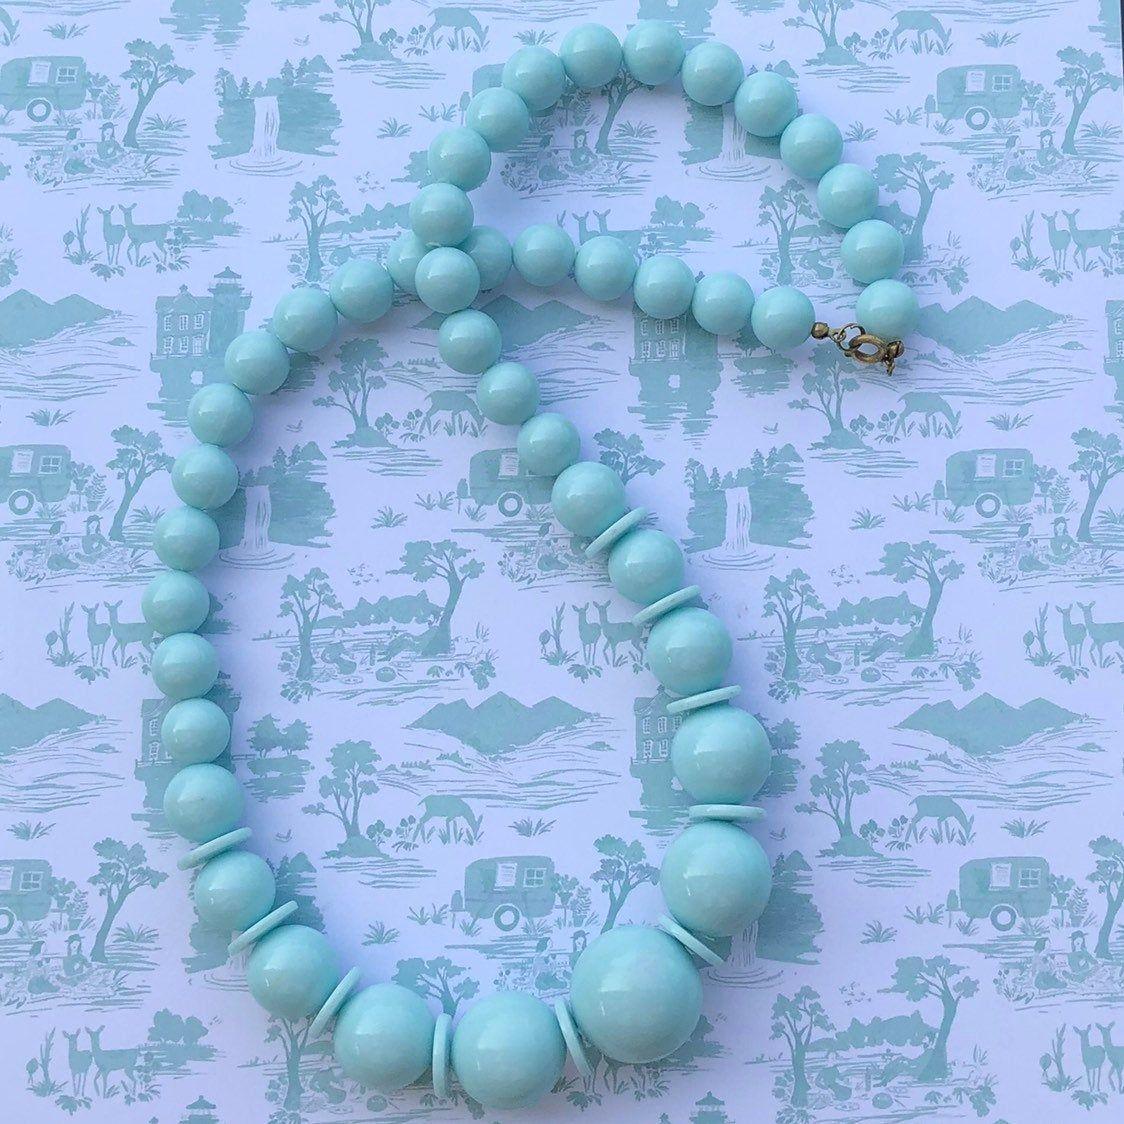 Vintage Beads Necklace Plastic Round Blue Beads Retro Etsy Kralen Kettingen Blauwe Ketting Plastic Sieraden